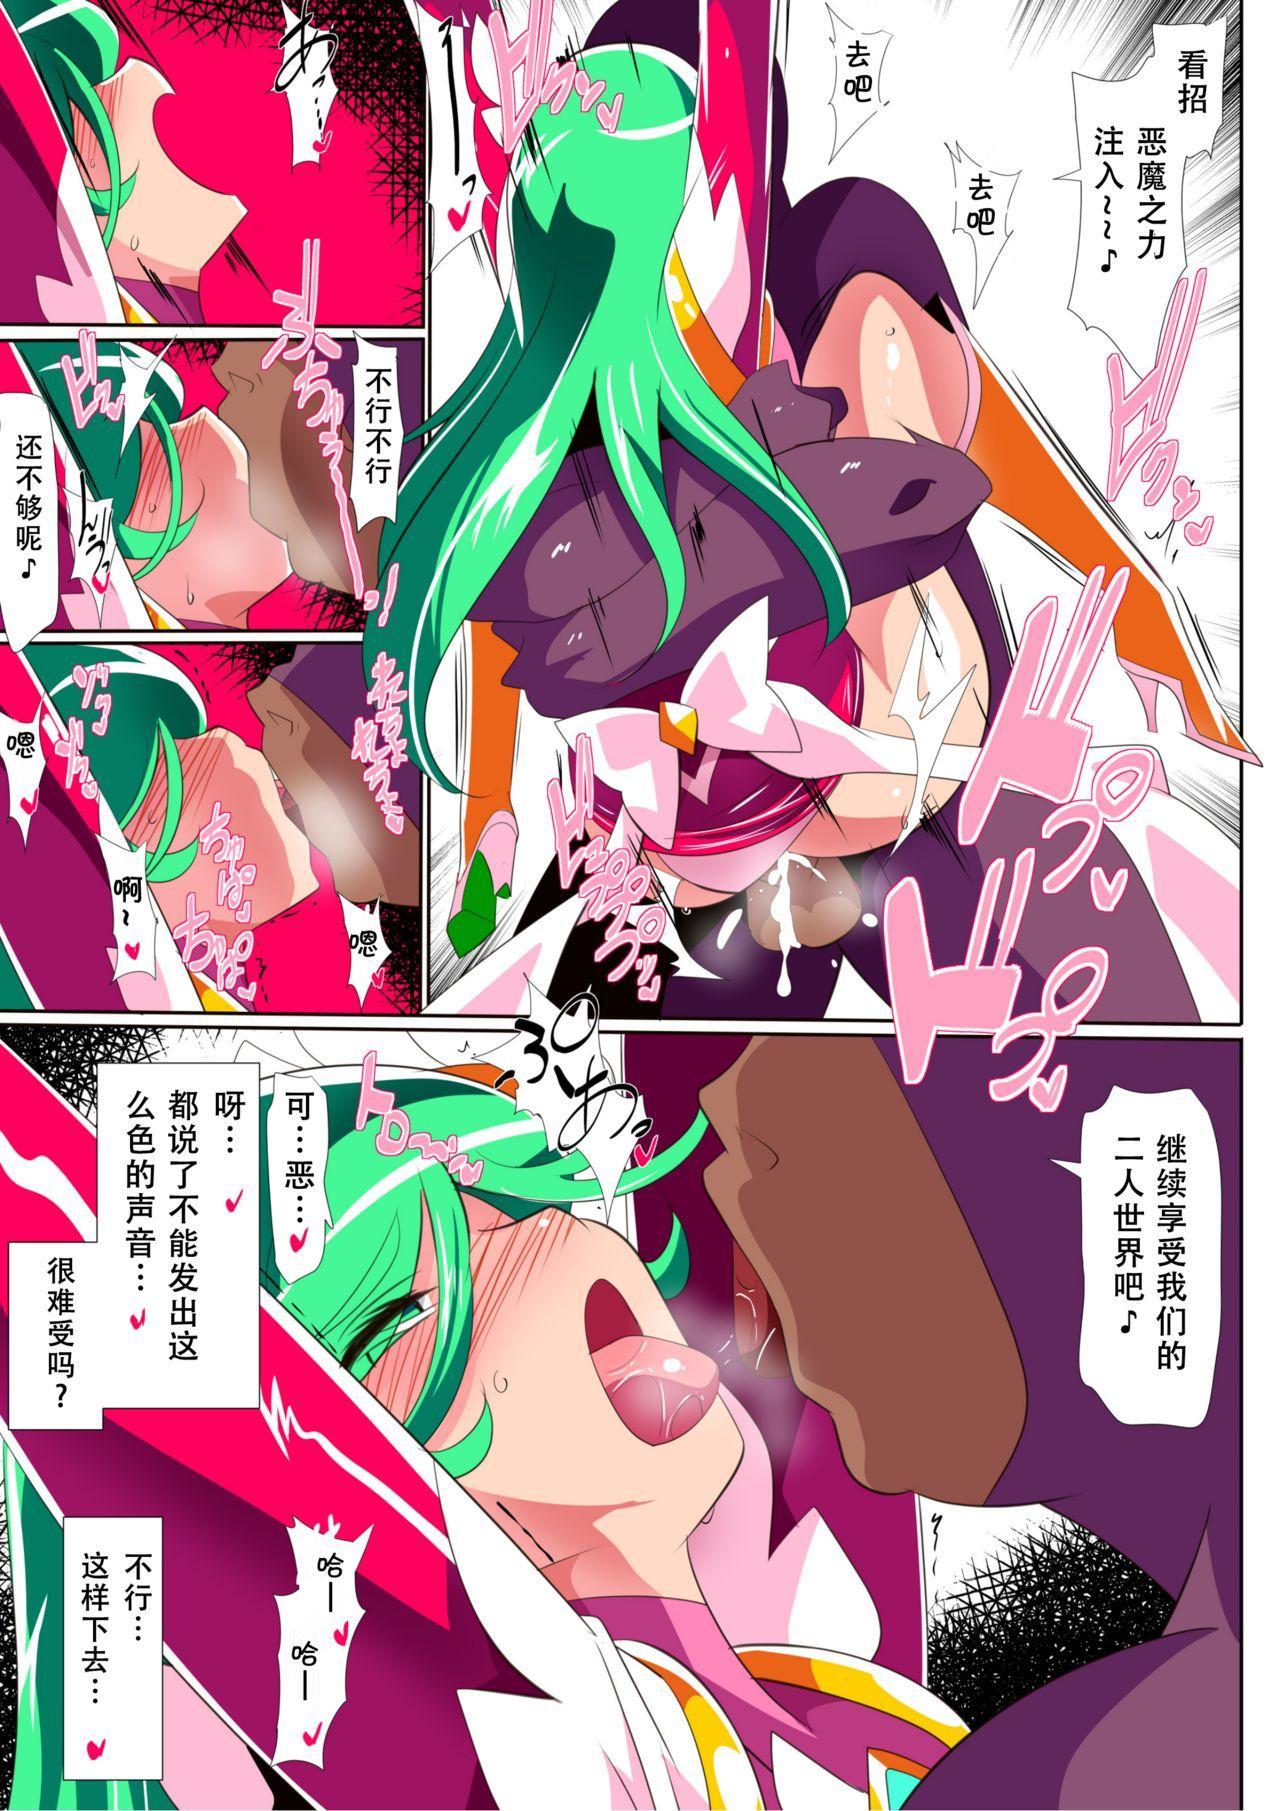 HEROINE LOSE 2 Psycho Lady Meteor Hen Psycho Power Heroine VS Kyousei Chikan Choukyou! 21